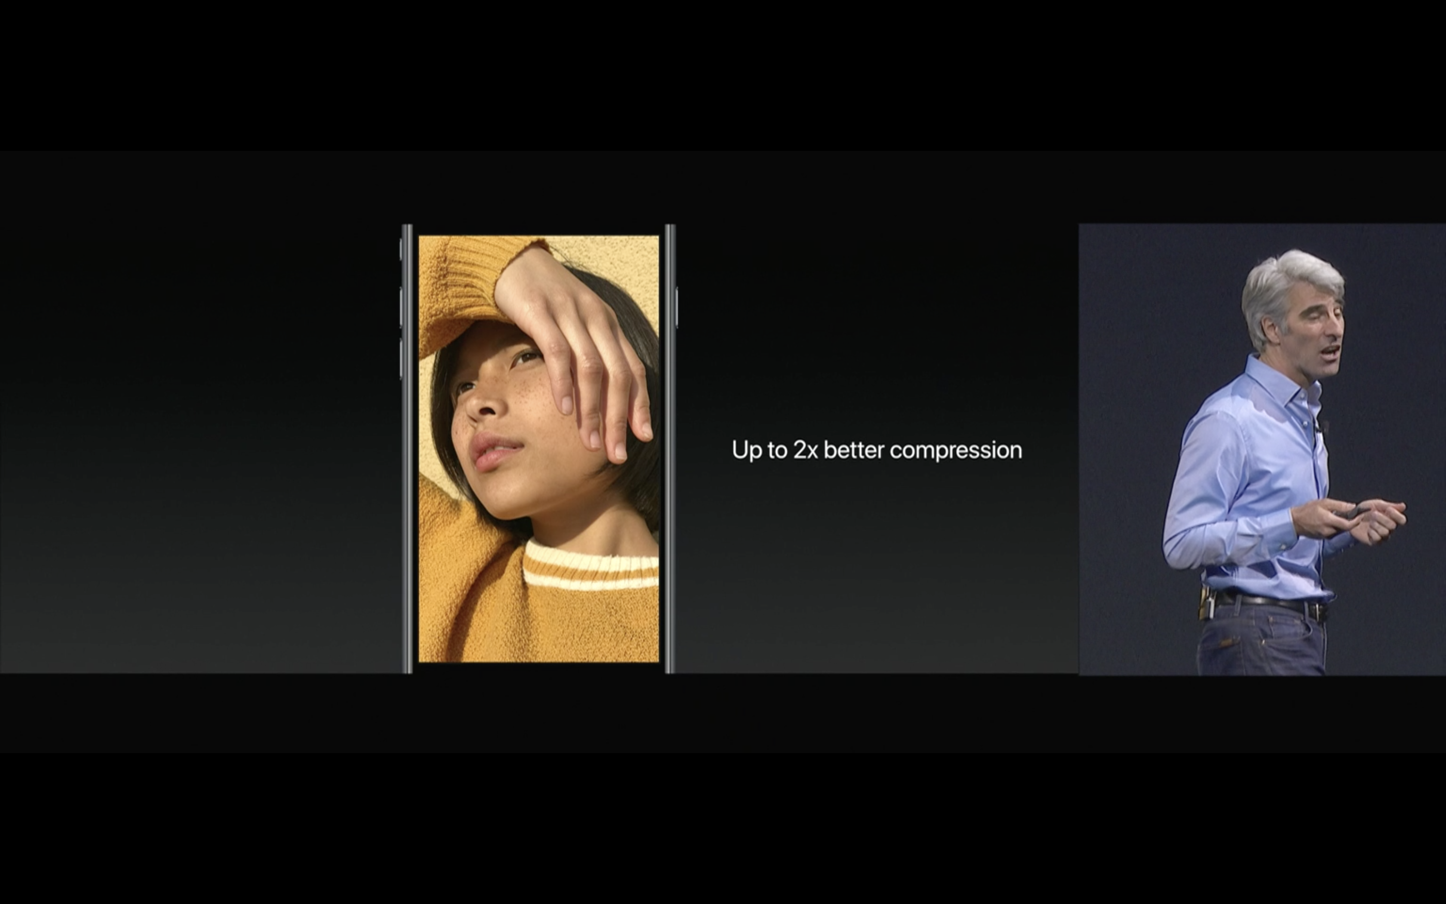 iOS11-2017-WWDC17-22.png